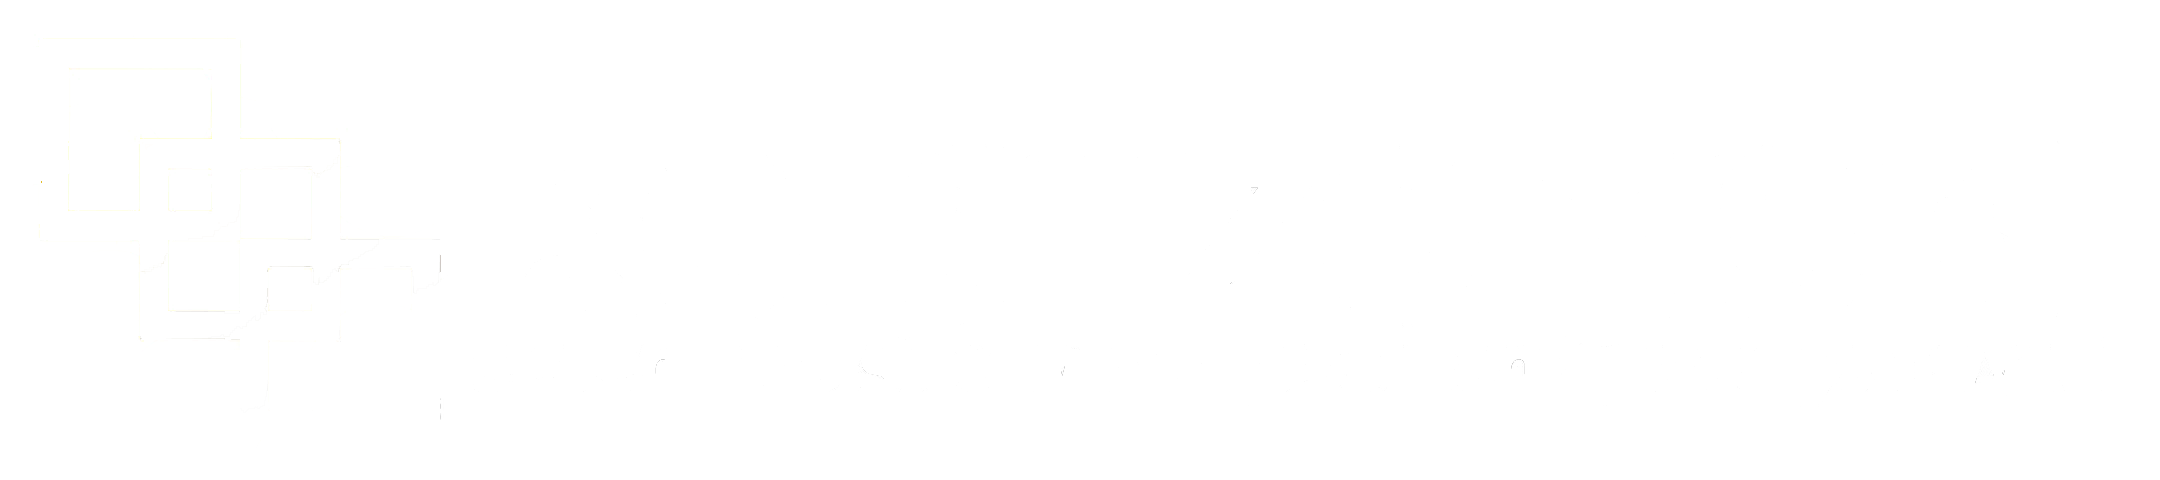 Kolarzowski